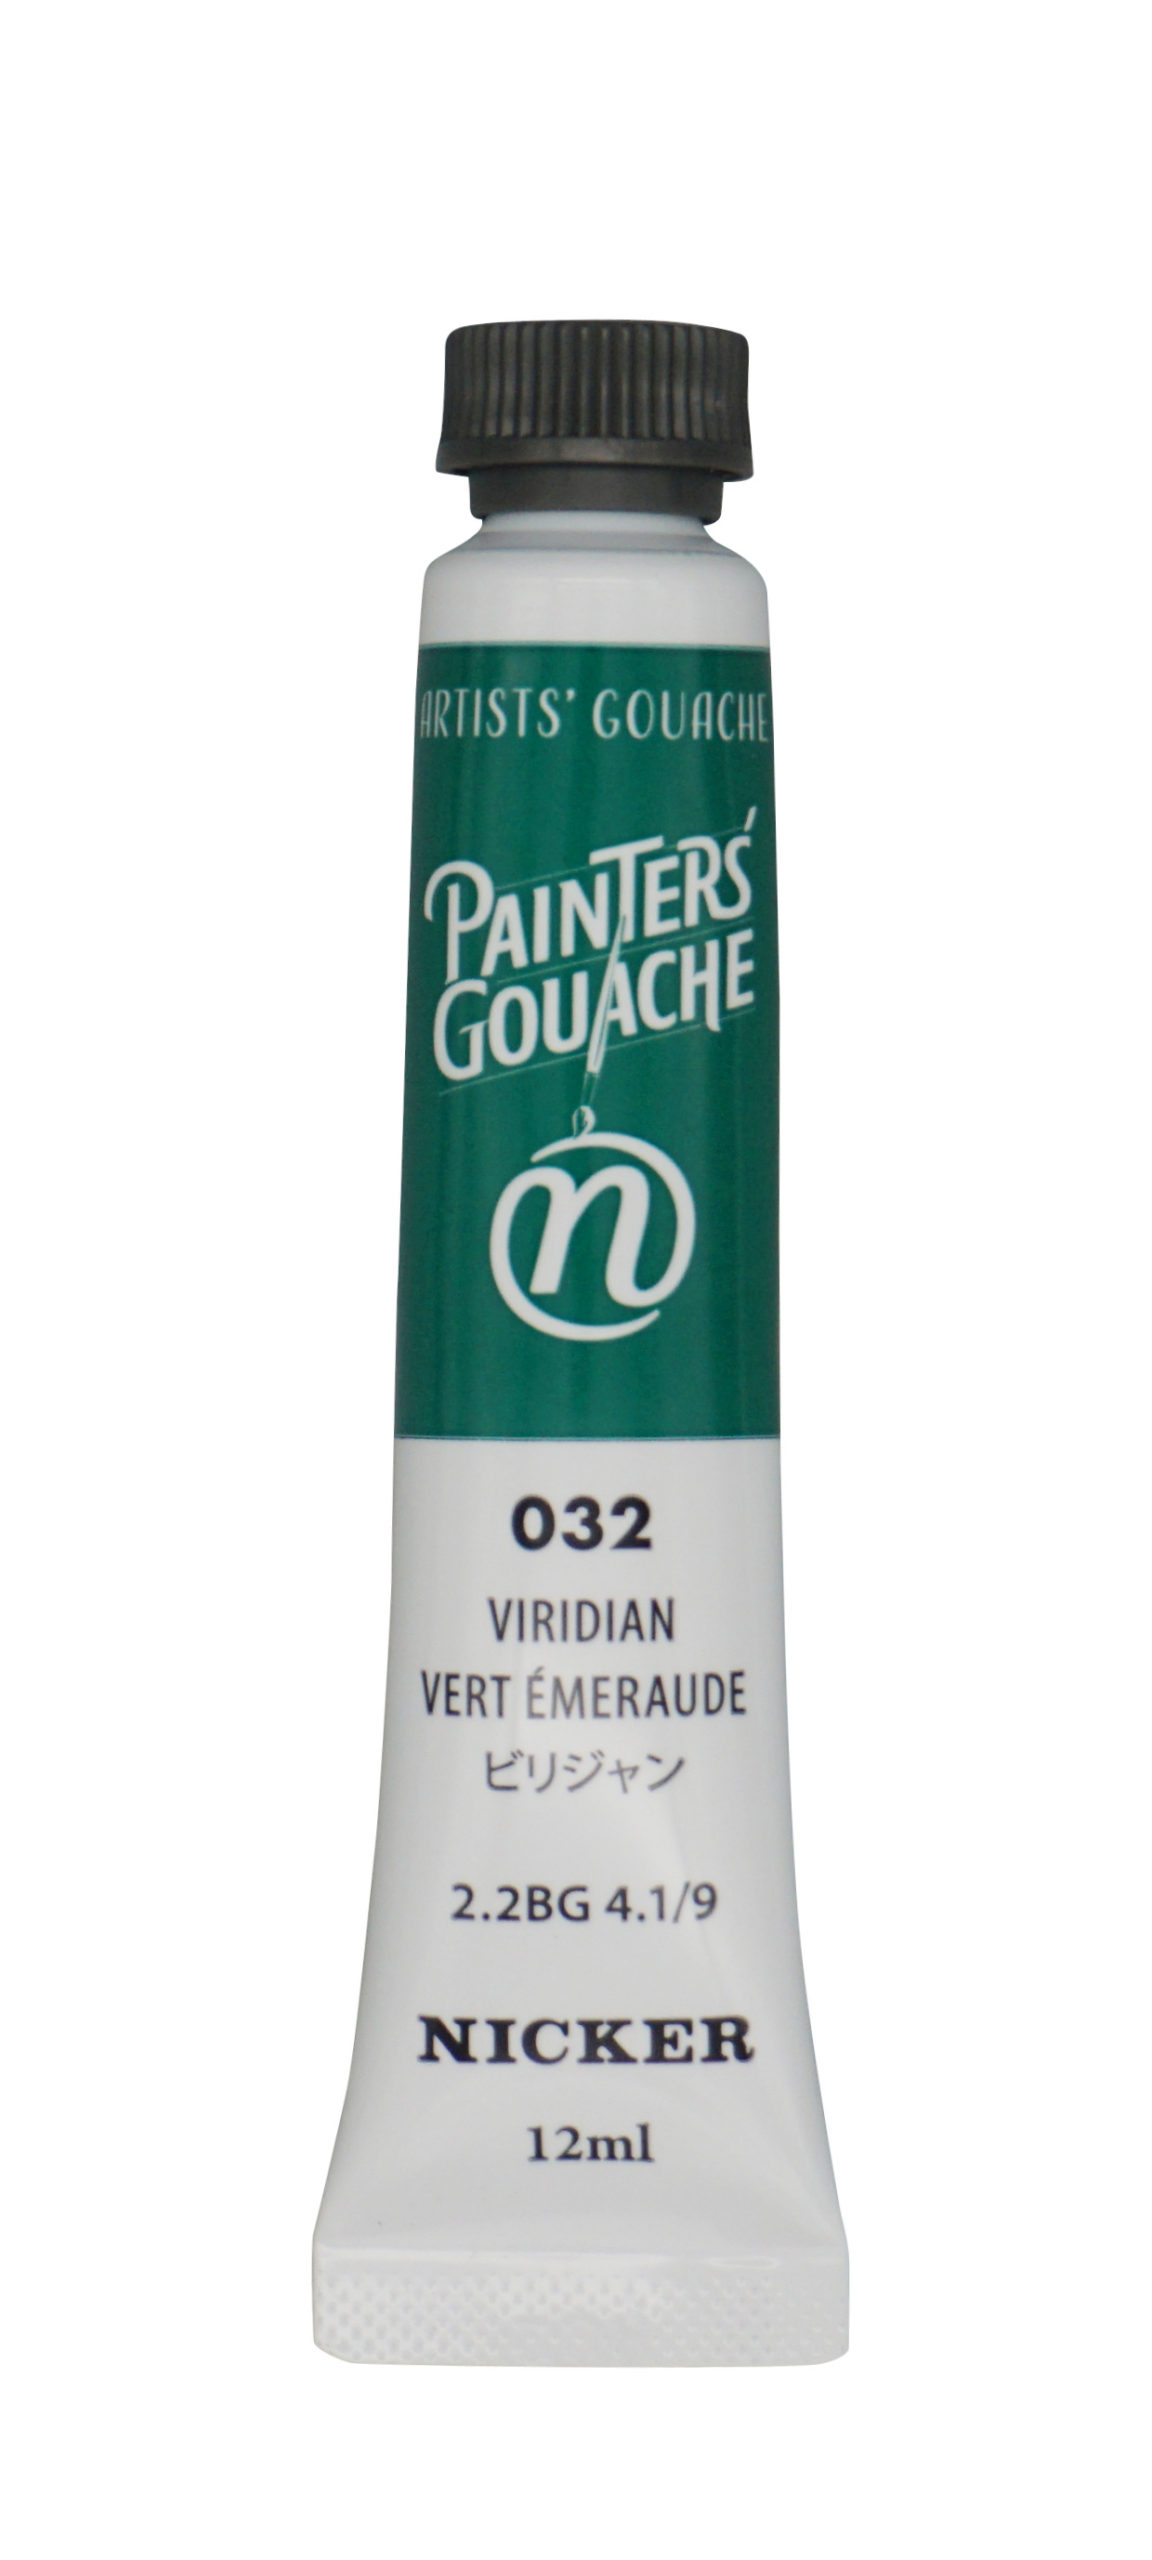 PAINTER'S GOUACHE VIRIDIAN